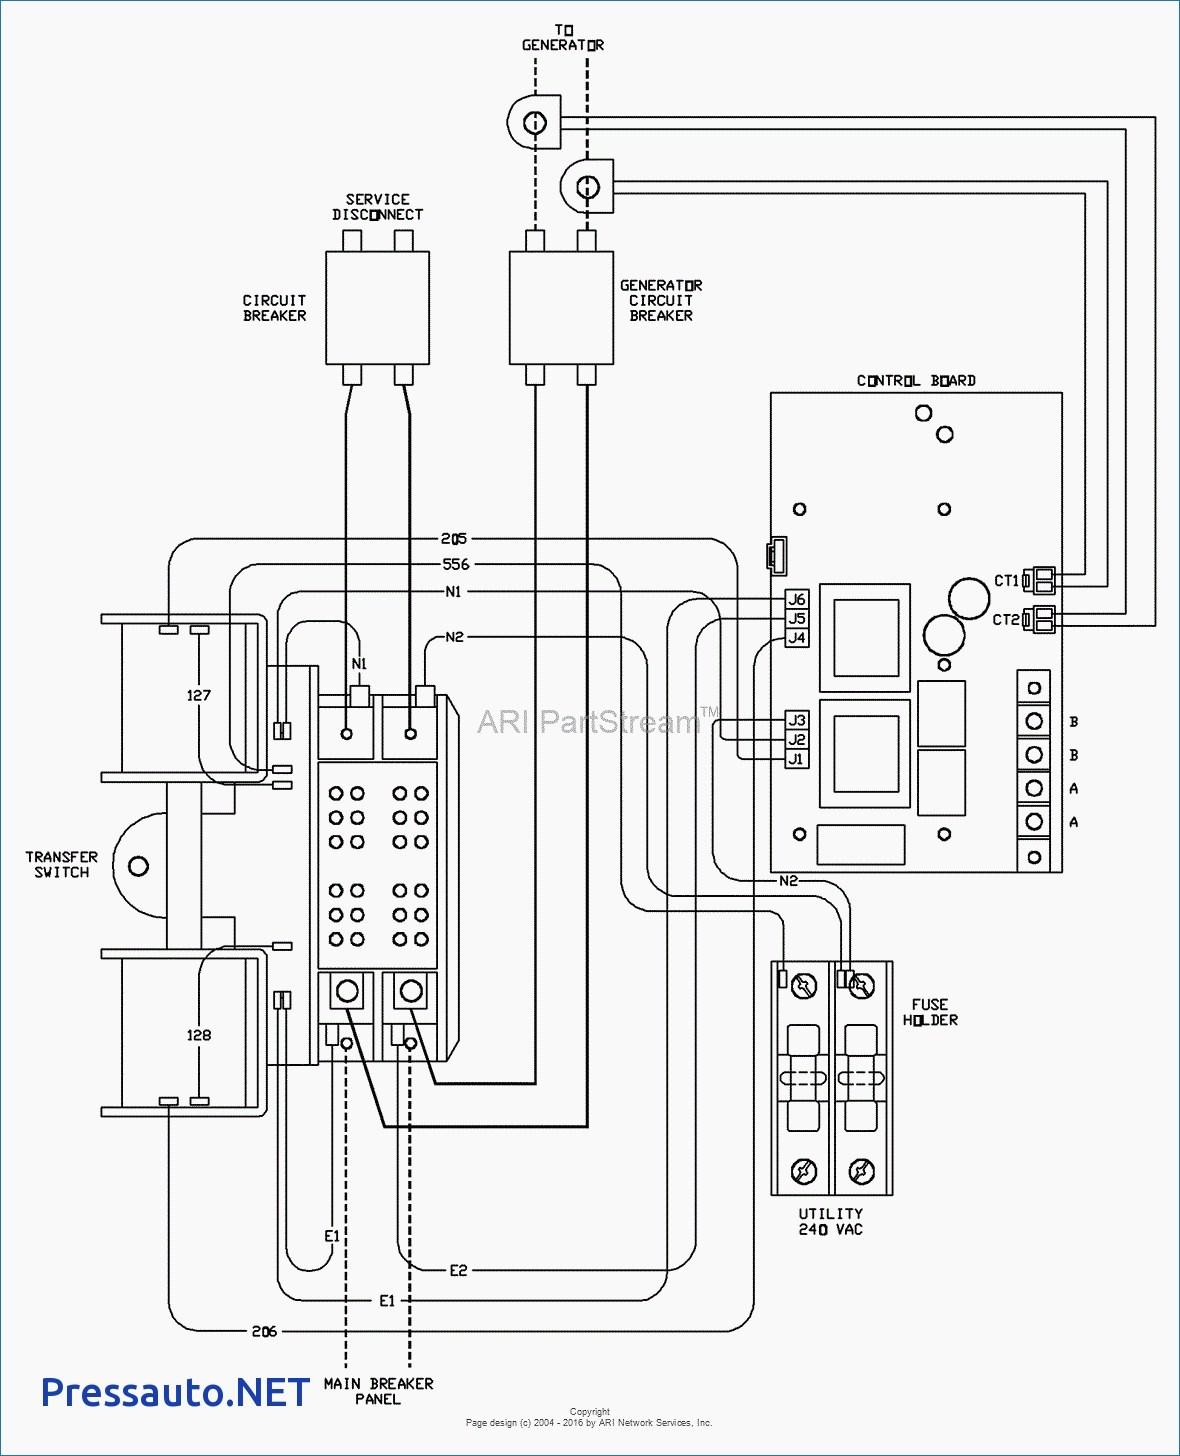 reliance generator transfer switch wiring diagram Collection-Whole House Transfer Switch Wiring Diagram Beautiful Generator Manual Transfer Switch Wiring Diagram 12-h